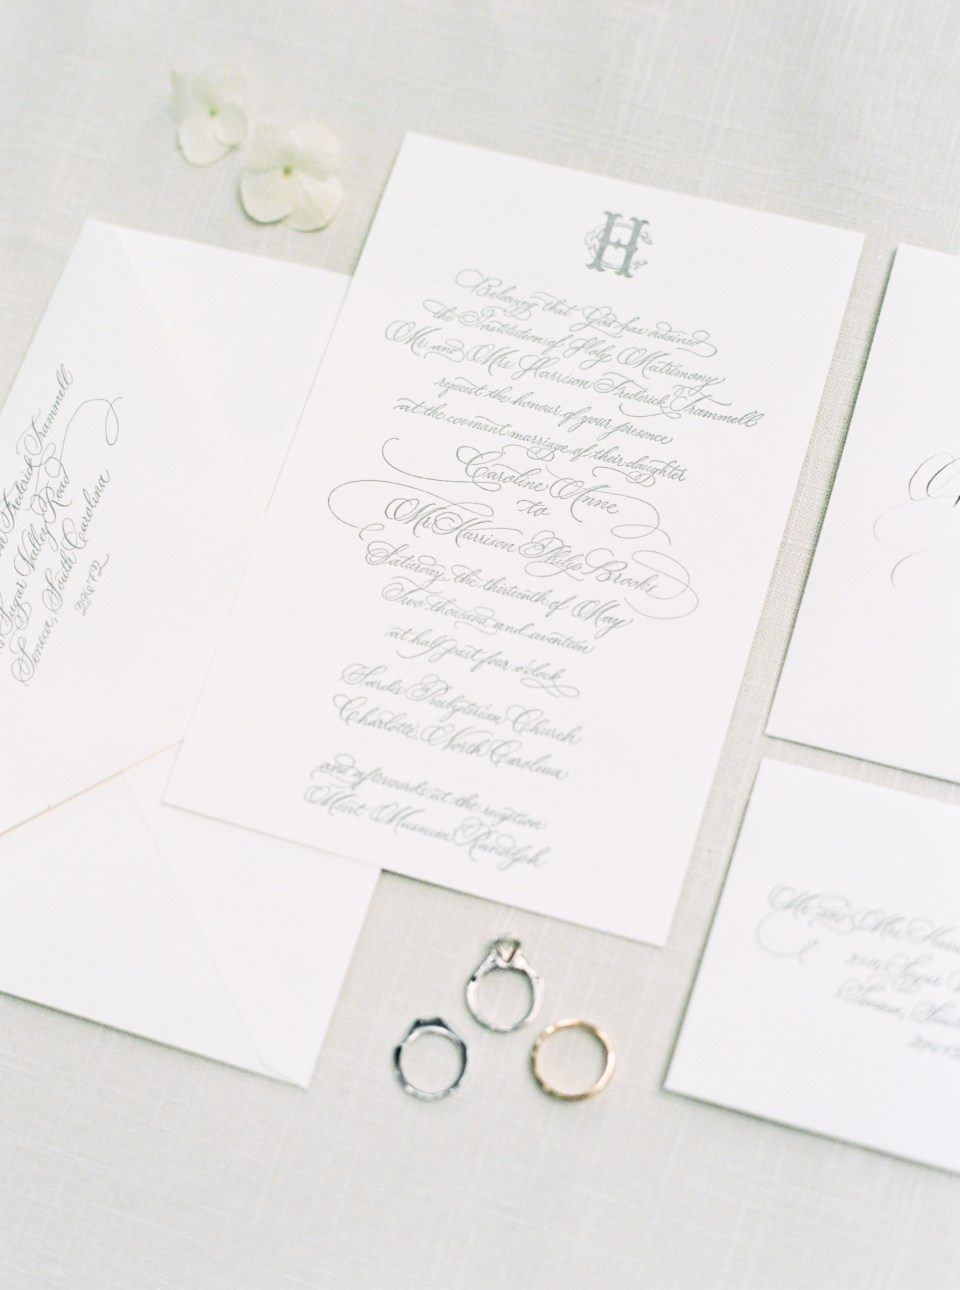 Classic southern wedding invitation calligraphy for North Carolina wedding by Ashlyn Writes Wedding Calligraphy Atlanta Wedding Calligrapher